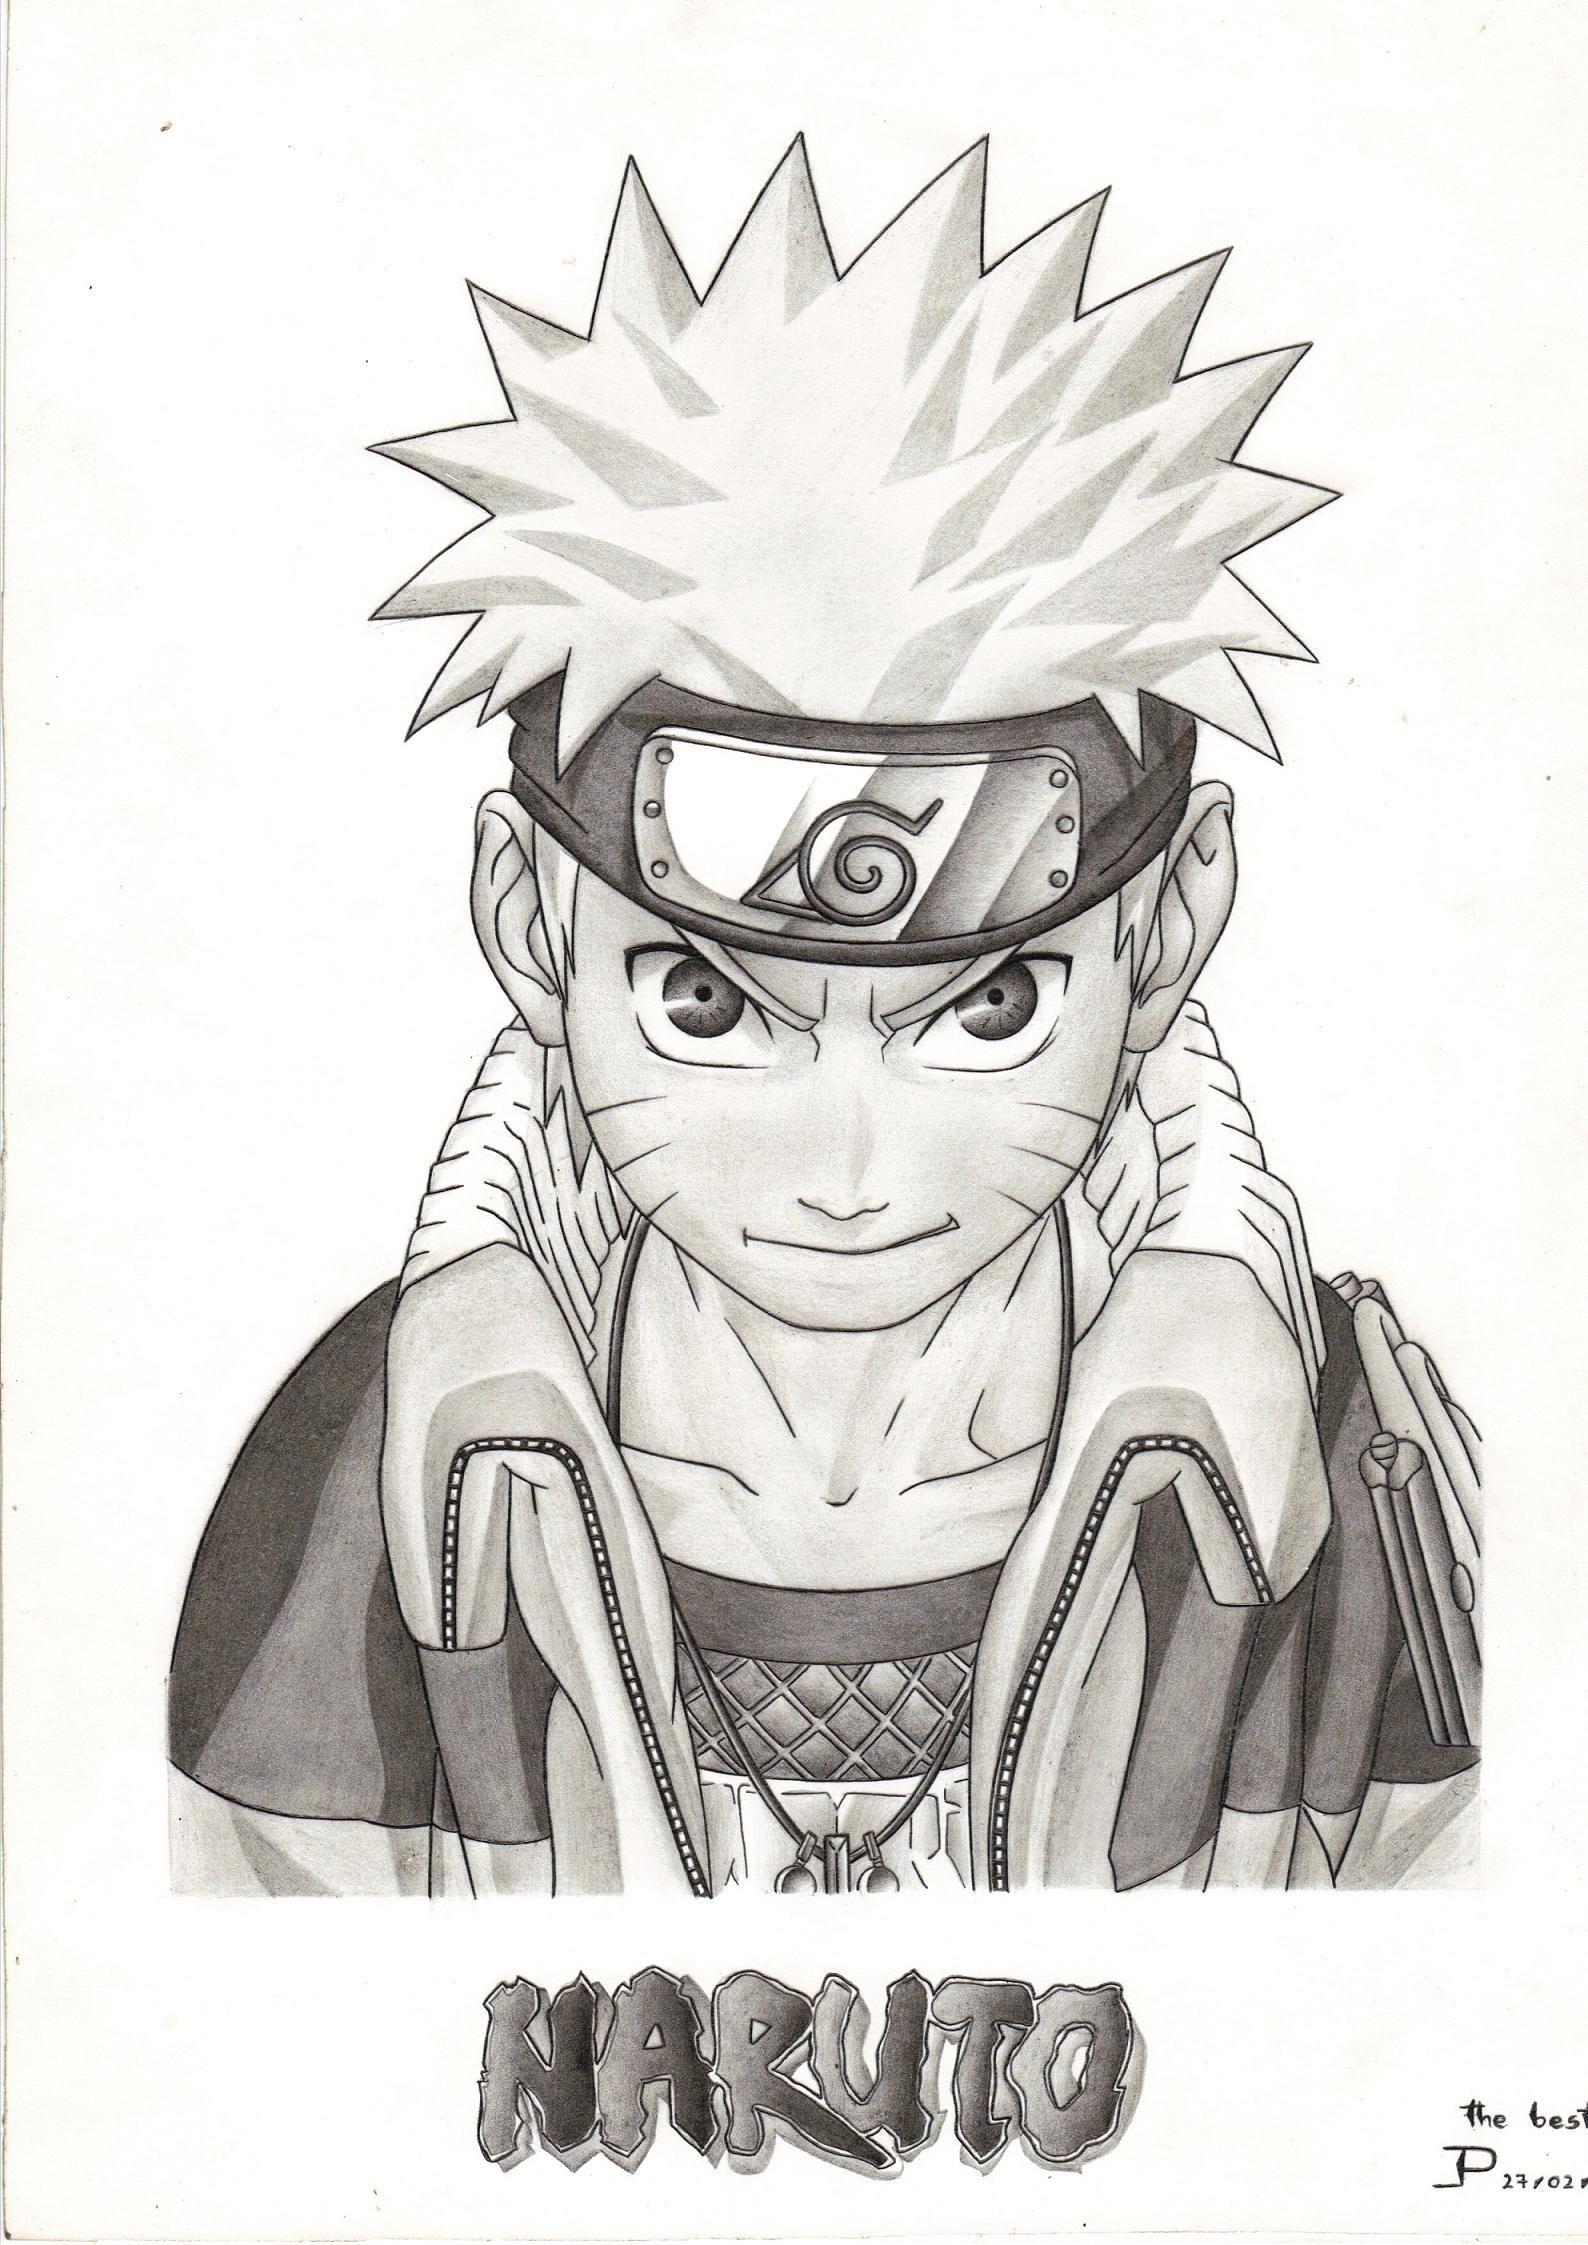 Naruto Naruto Naruto Dibujos Dibujos Y Dibujos A Lápiz